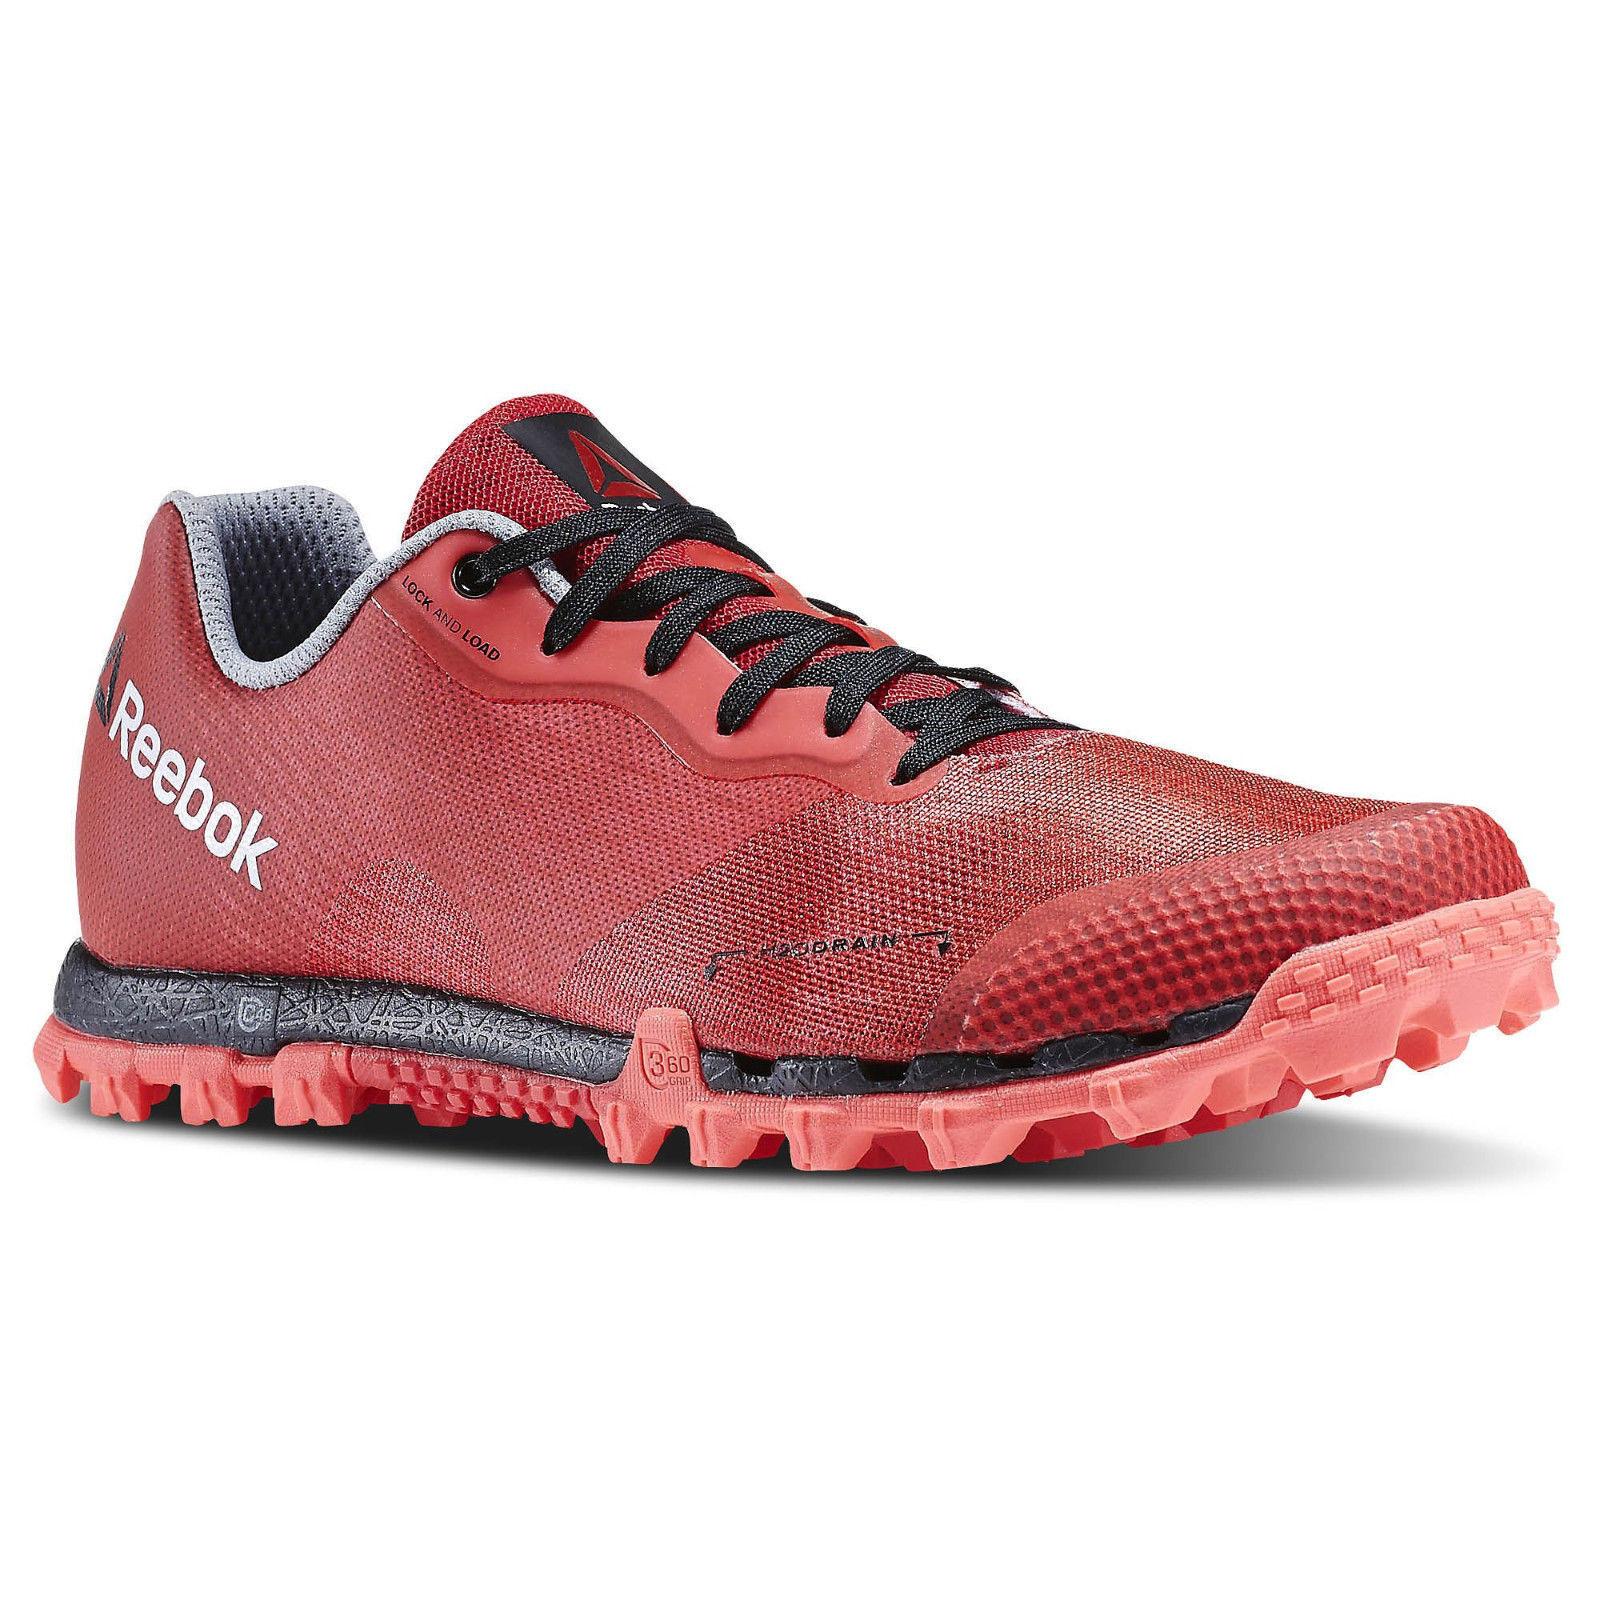 New Women's REEBOK Crossfit All Terrain Super 2.0 - V65912 Red Training Sneaker